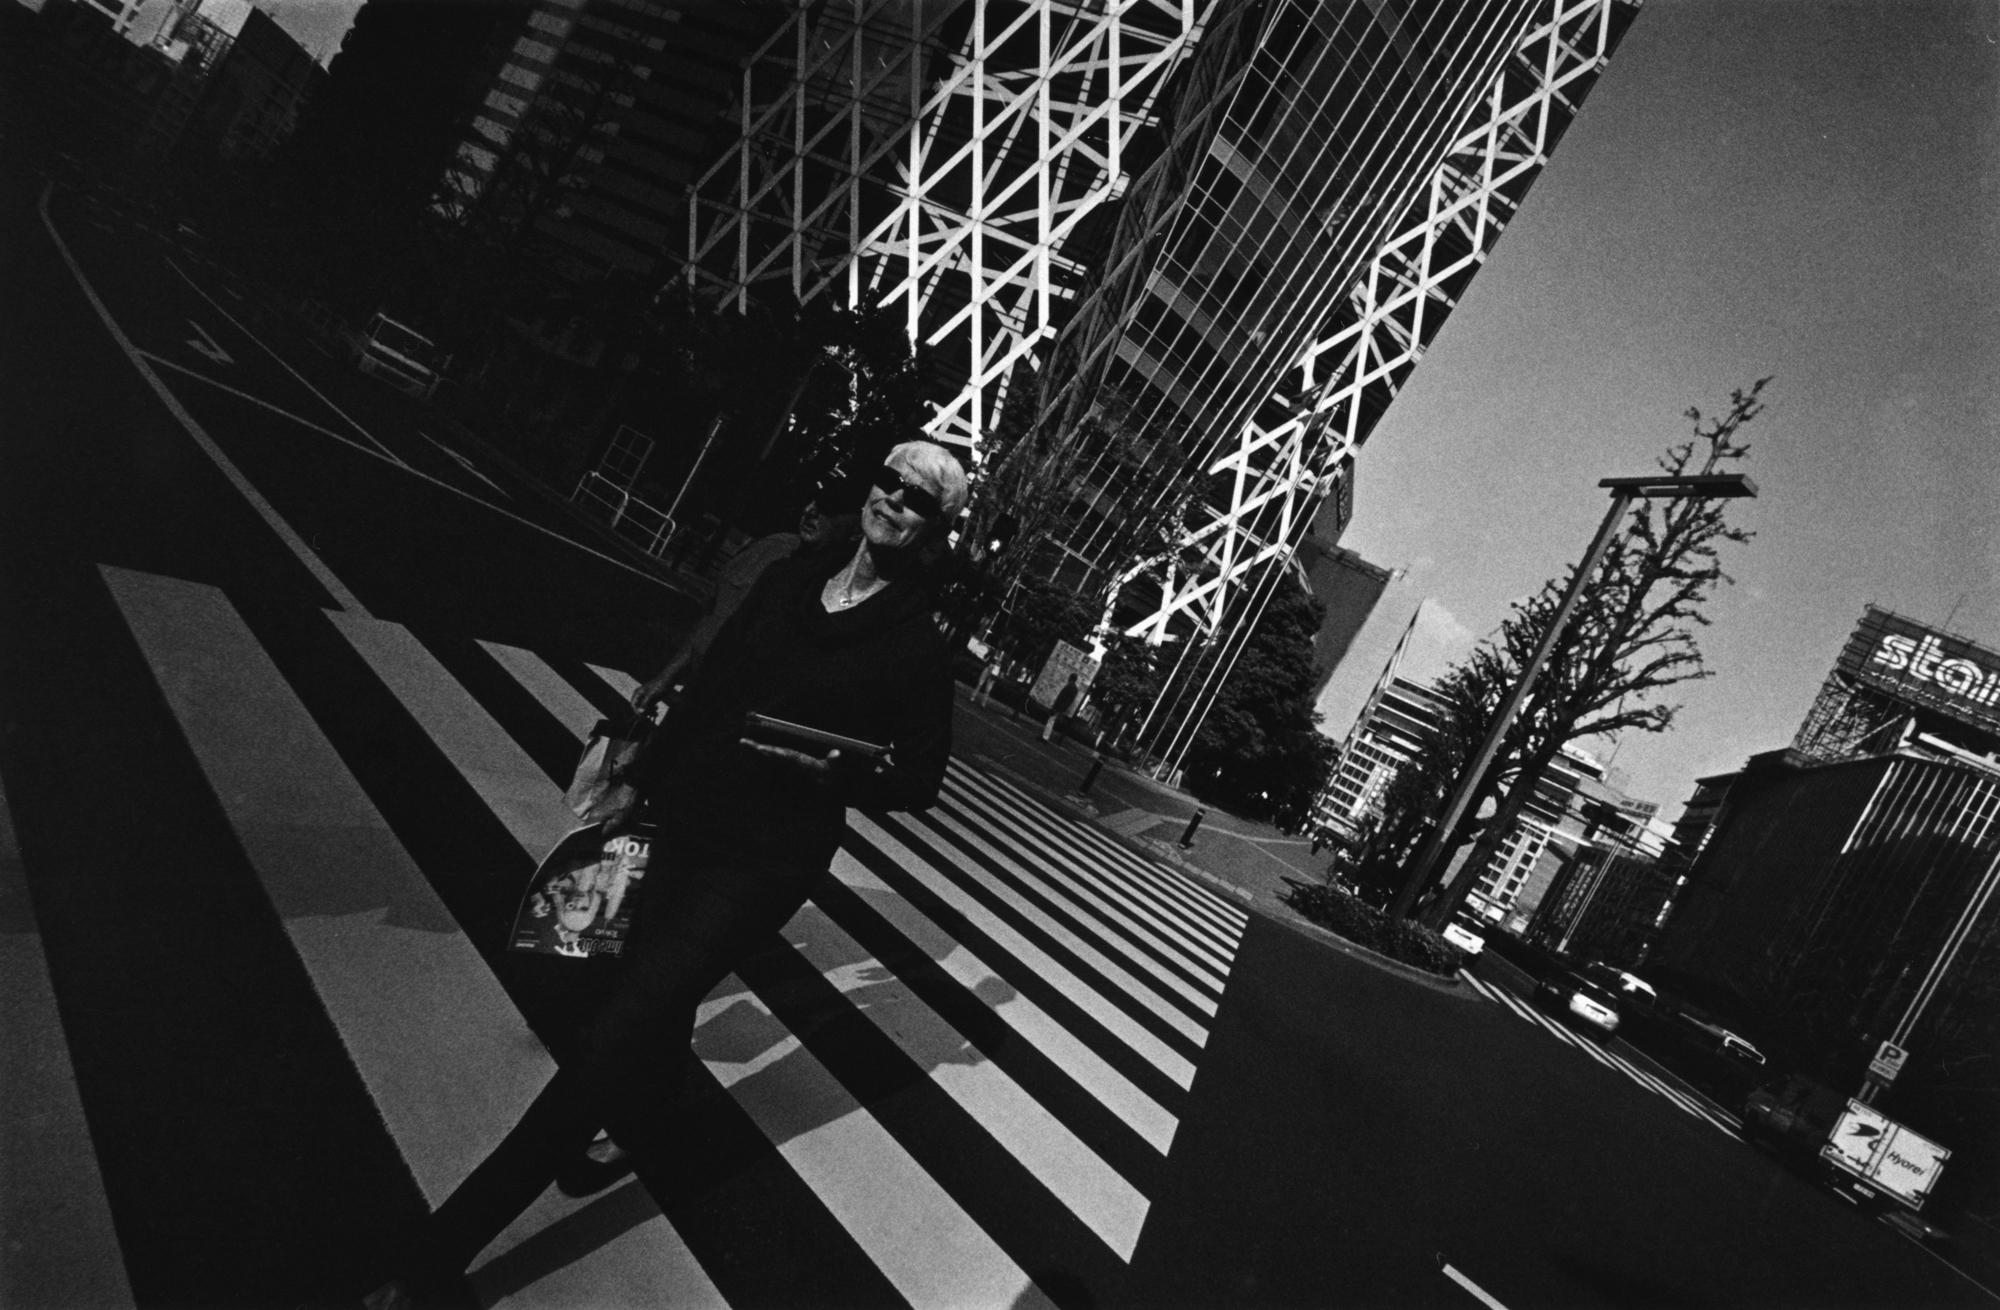 20140424 LeicaM4-P SWH15 NP400 SPD 0518 FujiWPFM3 001s